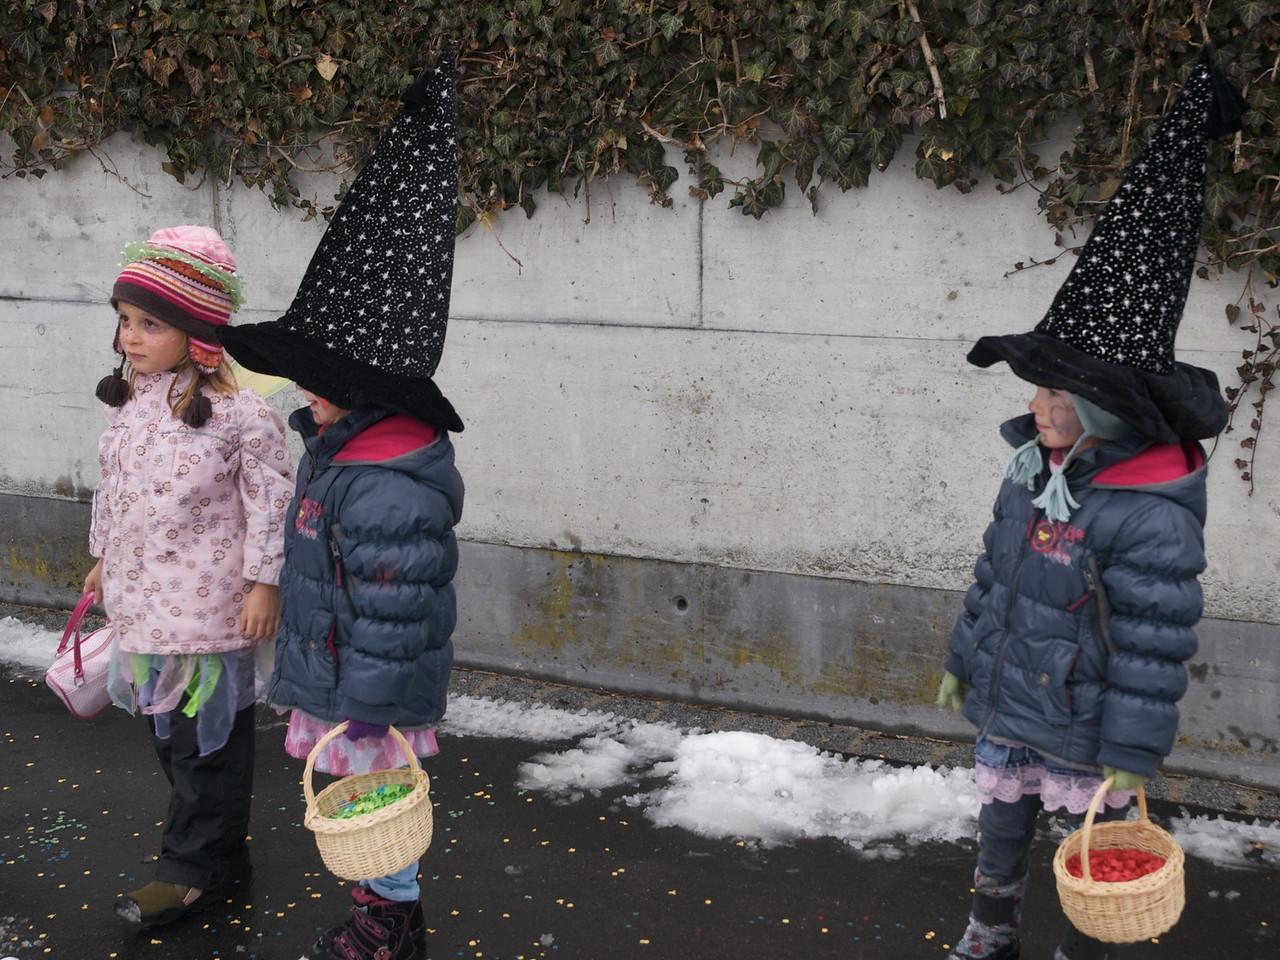 Sunday 22nd Feb 2009 - Three girls wait to ambush the next passer by